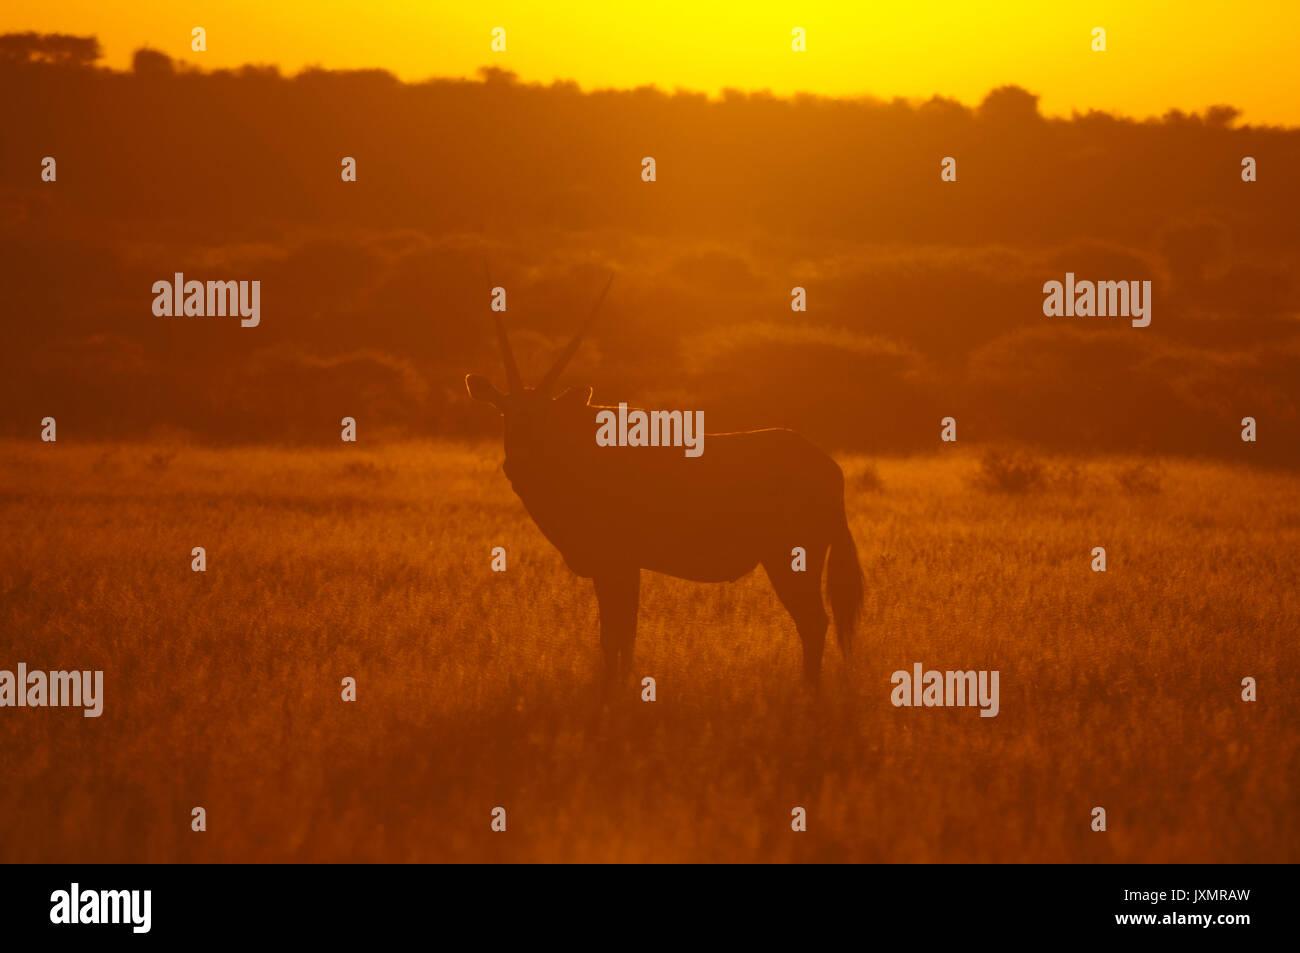 Gemsbok (Oryx gazella), Deception Valley, Central Kalahari Game Reserve, Botswana - Stock Image